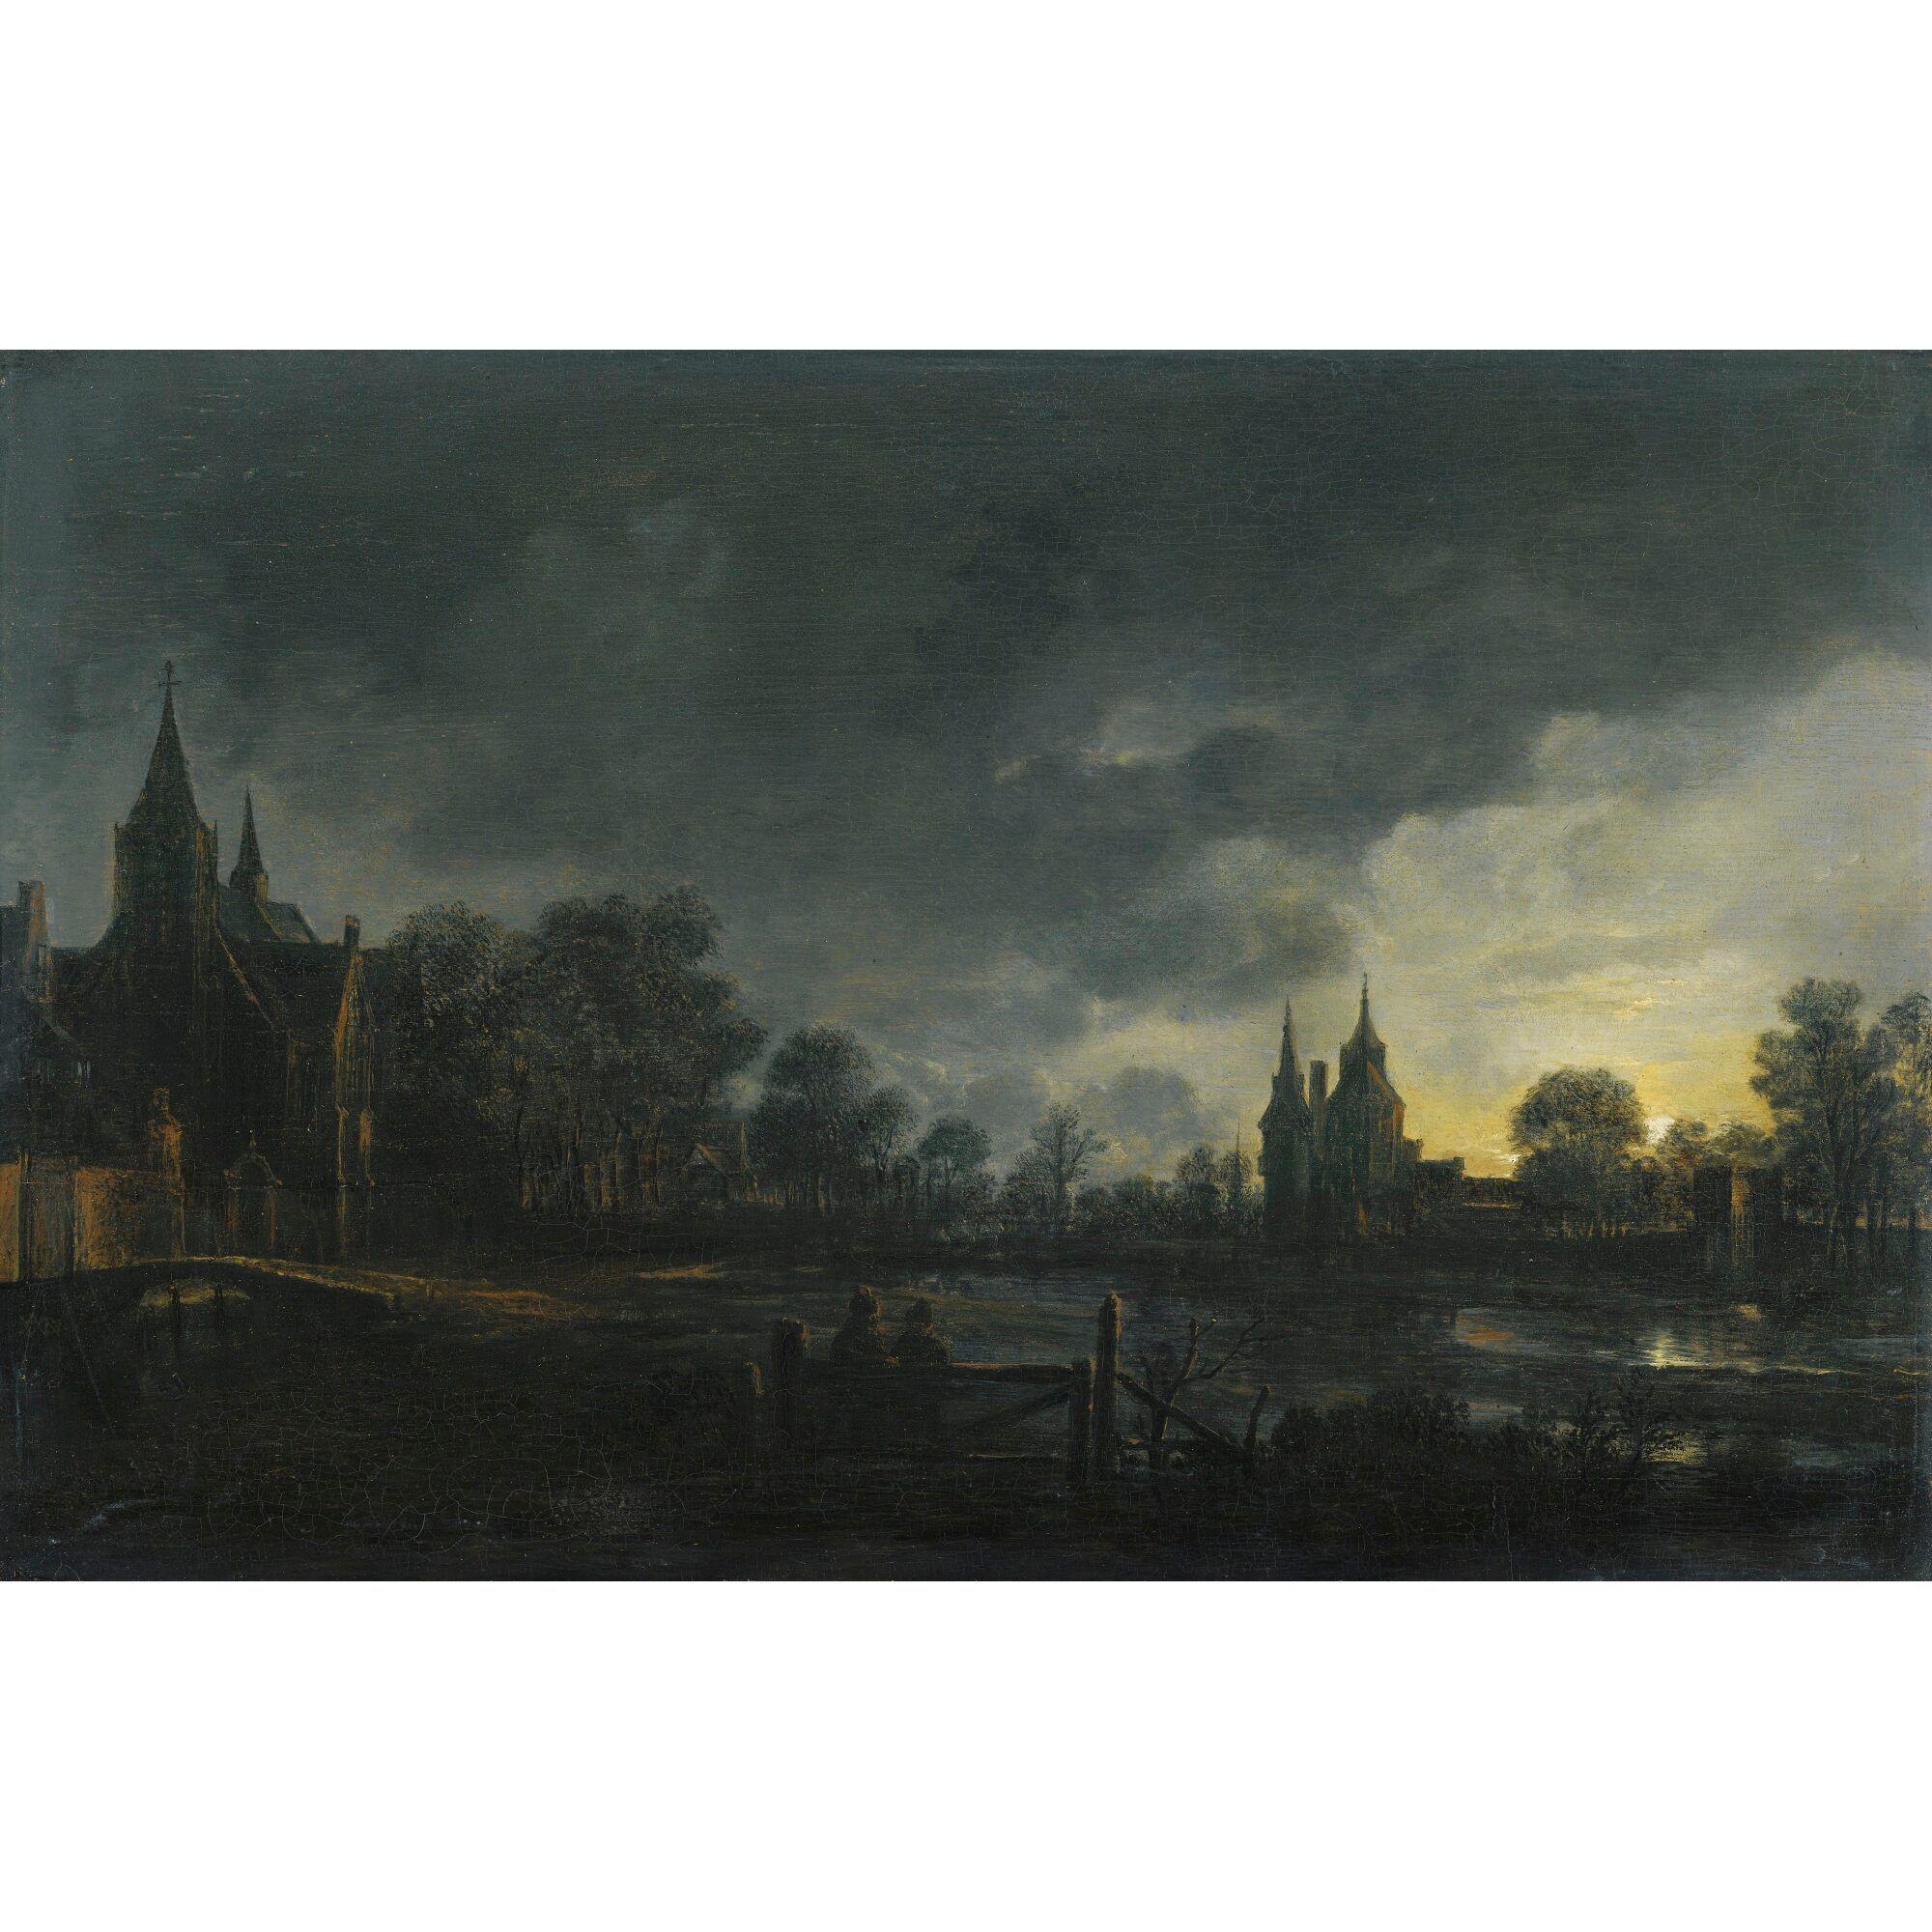 neer, aert van der a moonlit r ||| landscape ||| sotheby's l11037lot3s7kgen